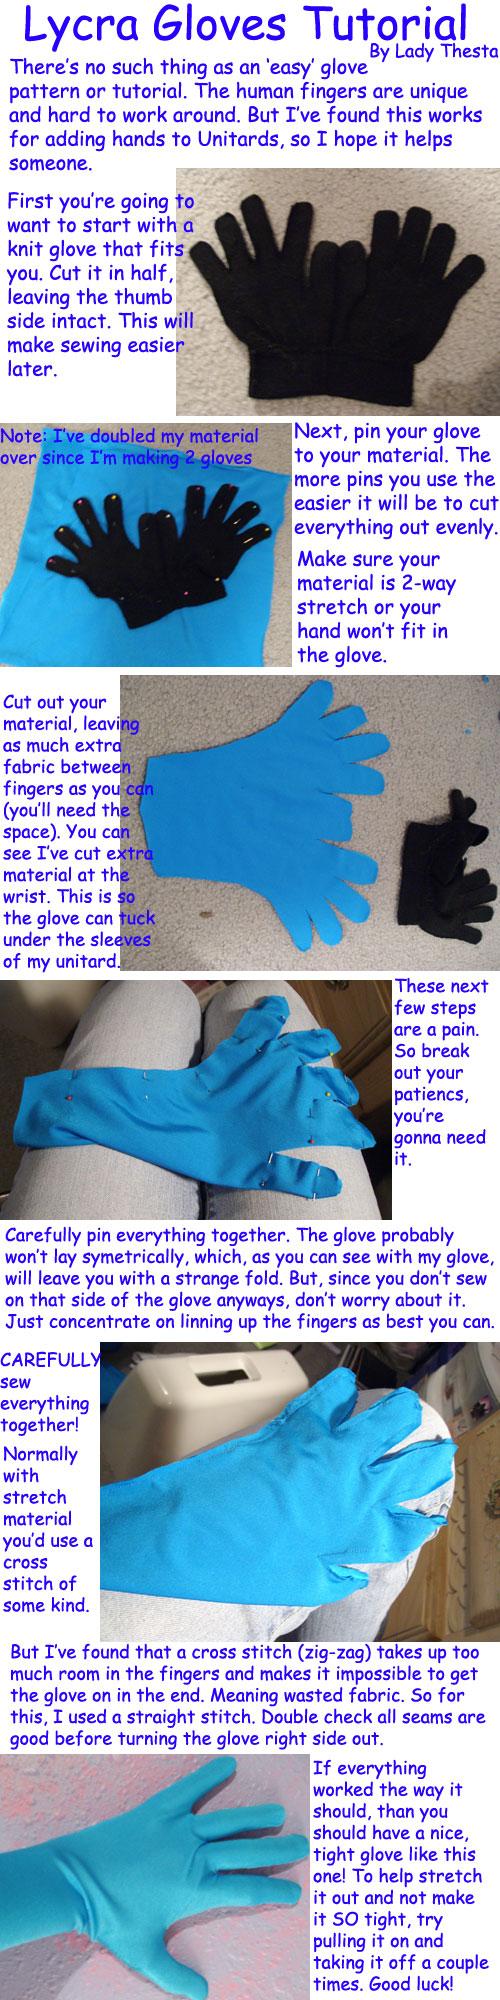 Lycra Glove Sewing Tutorial